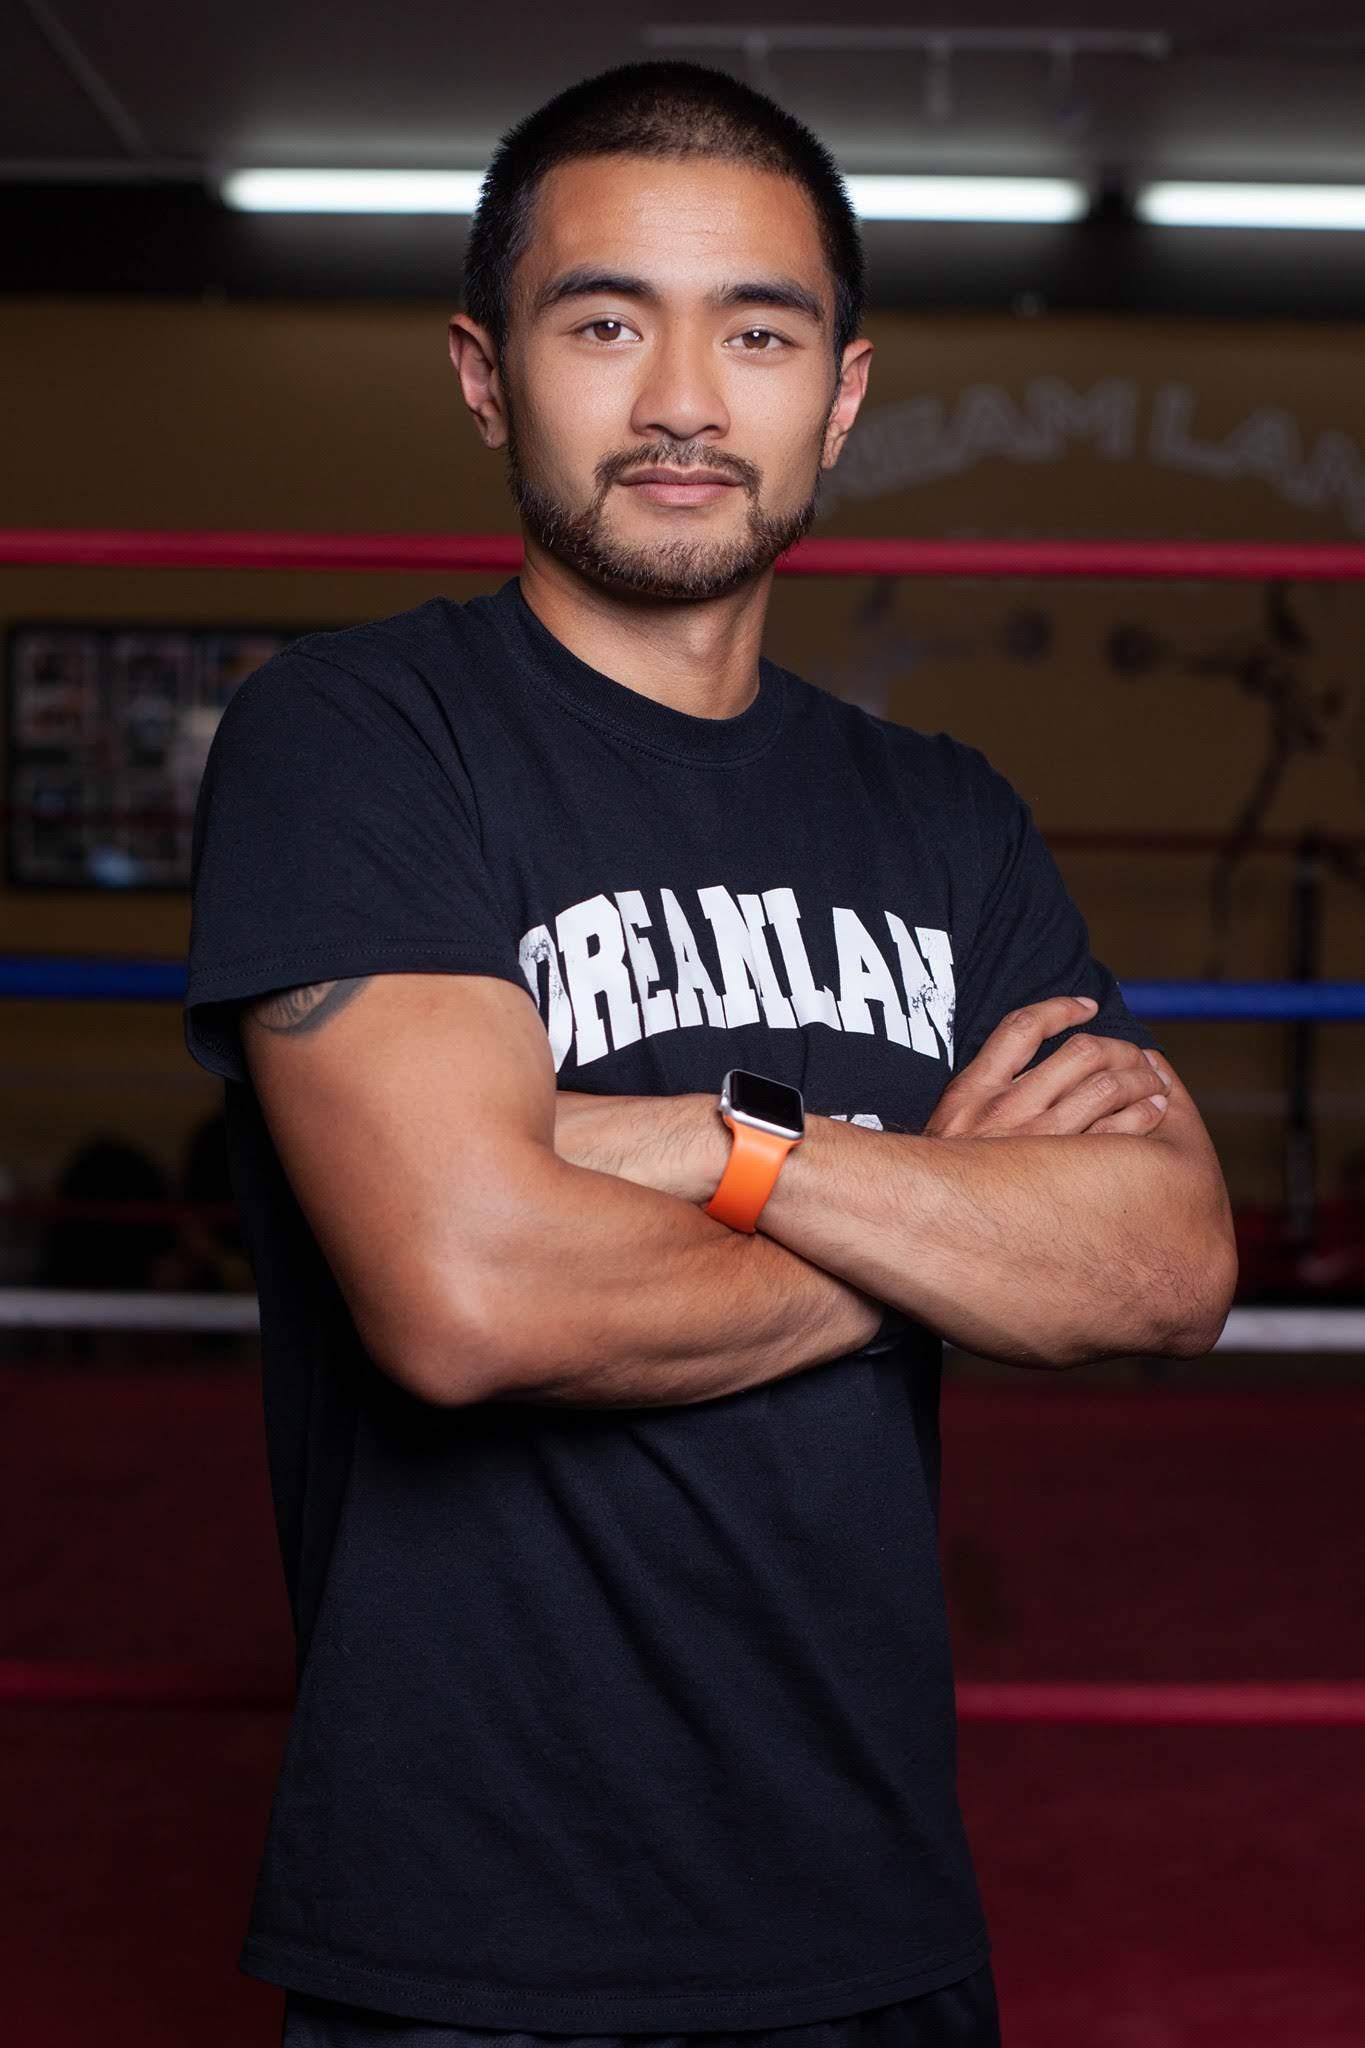 Dreamland Boxing Online Courses - Coach Ian Cruz